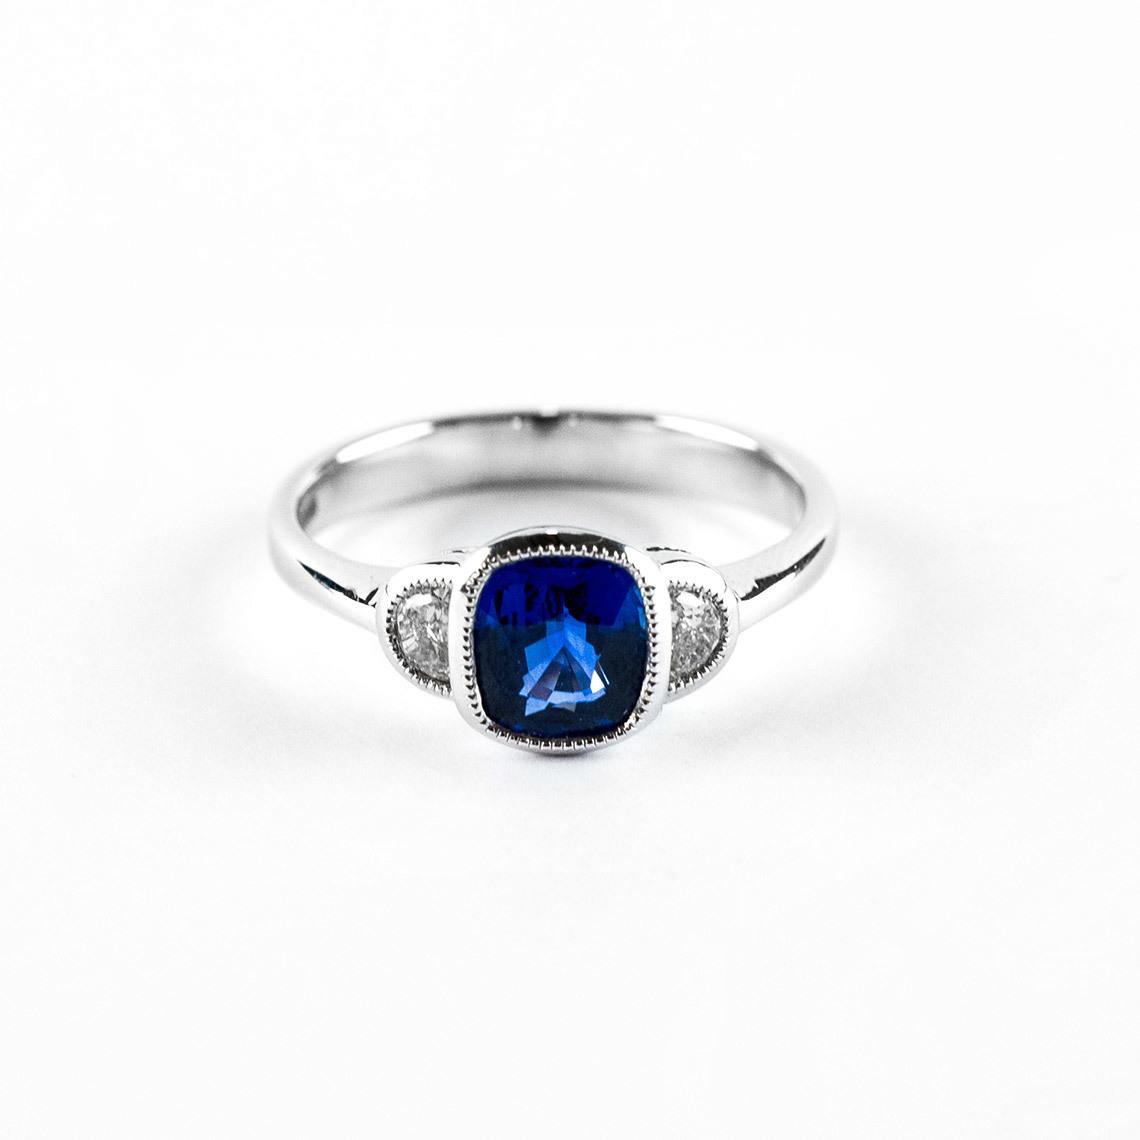 094e2b28c8 White Gold Ring Sapphire and Diamond £4880